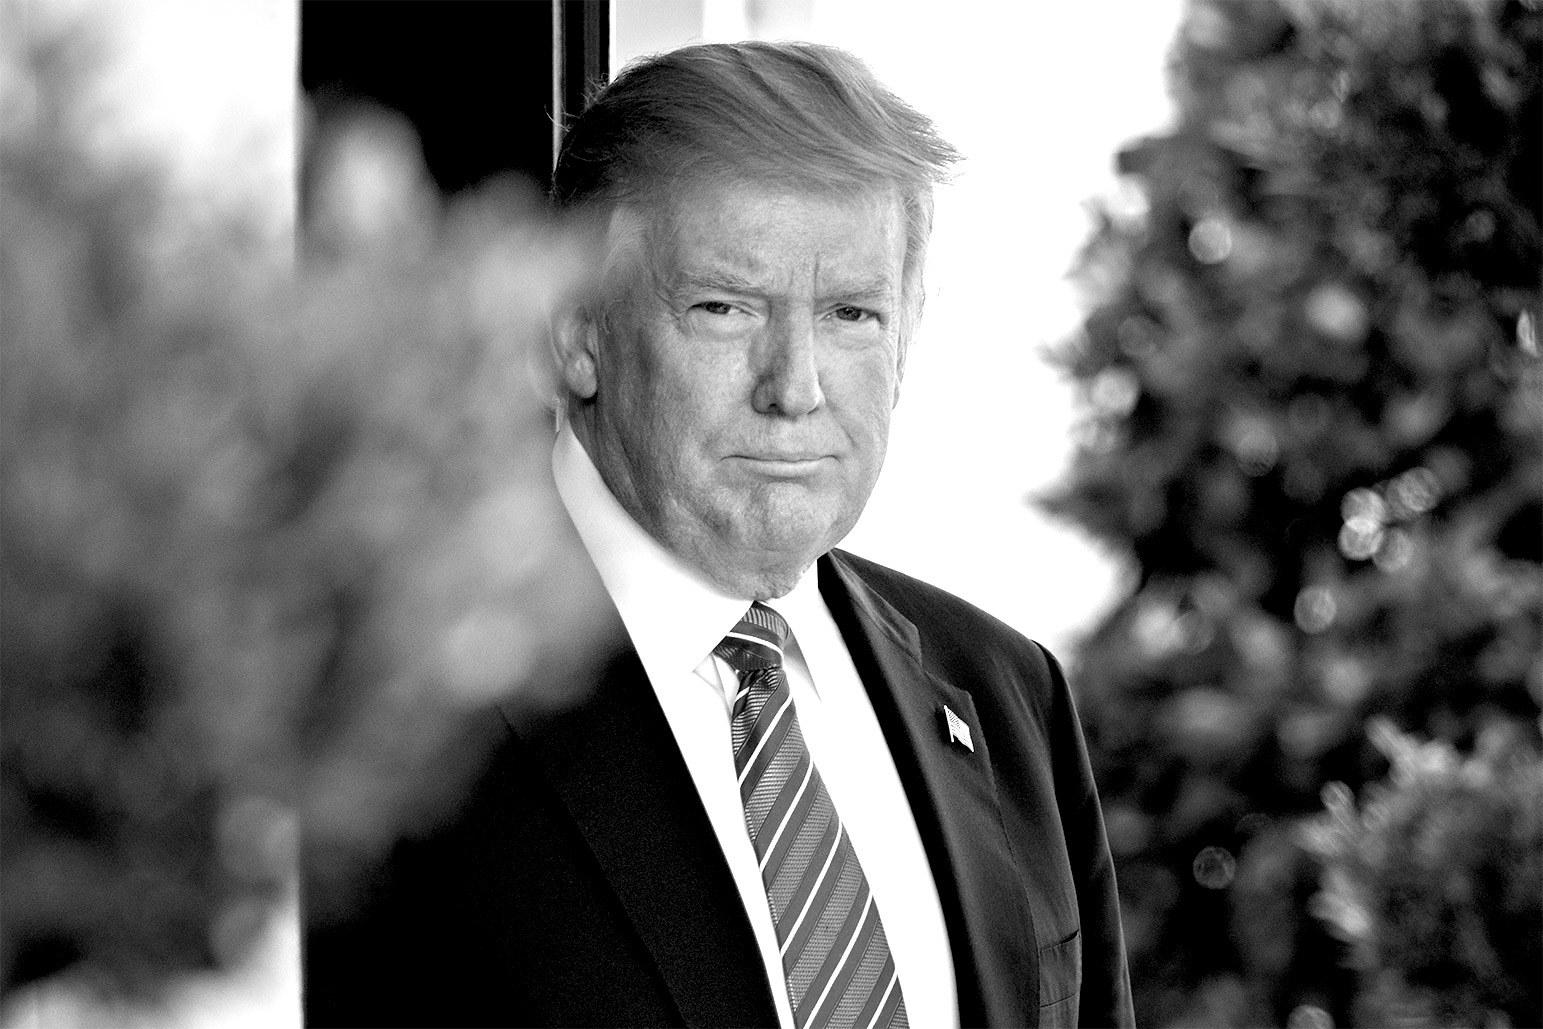 Trump-Condemn-Nazis.jpg